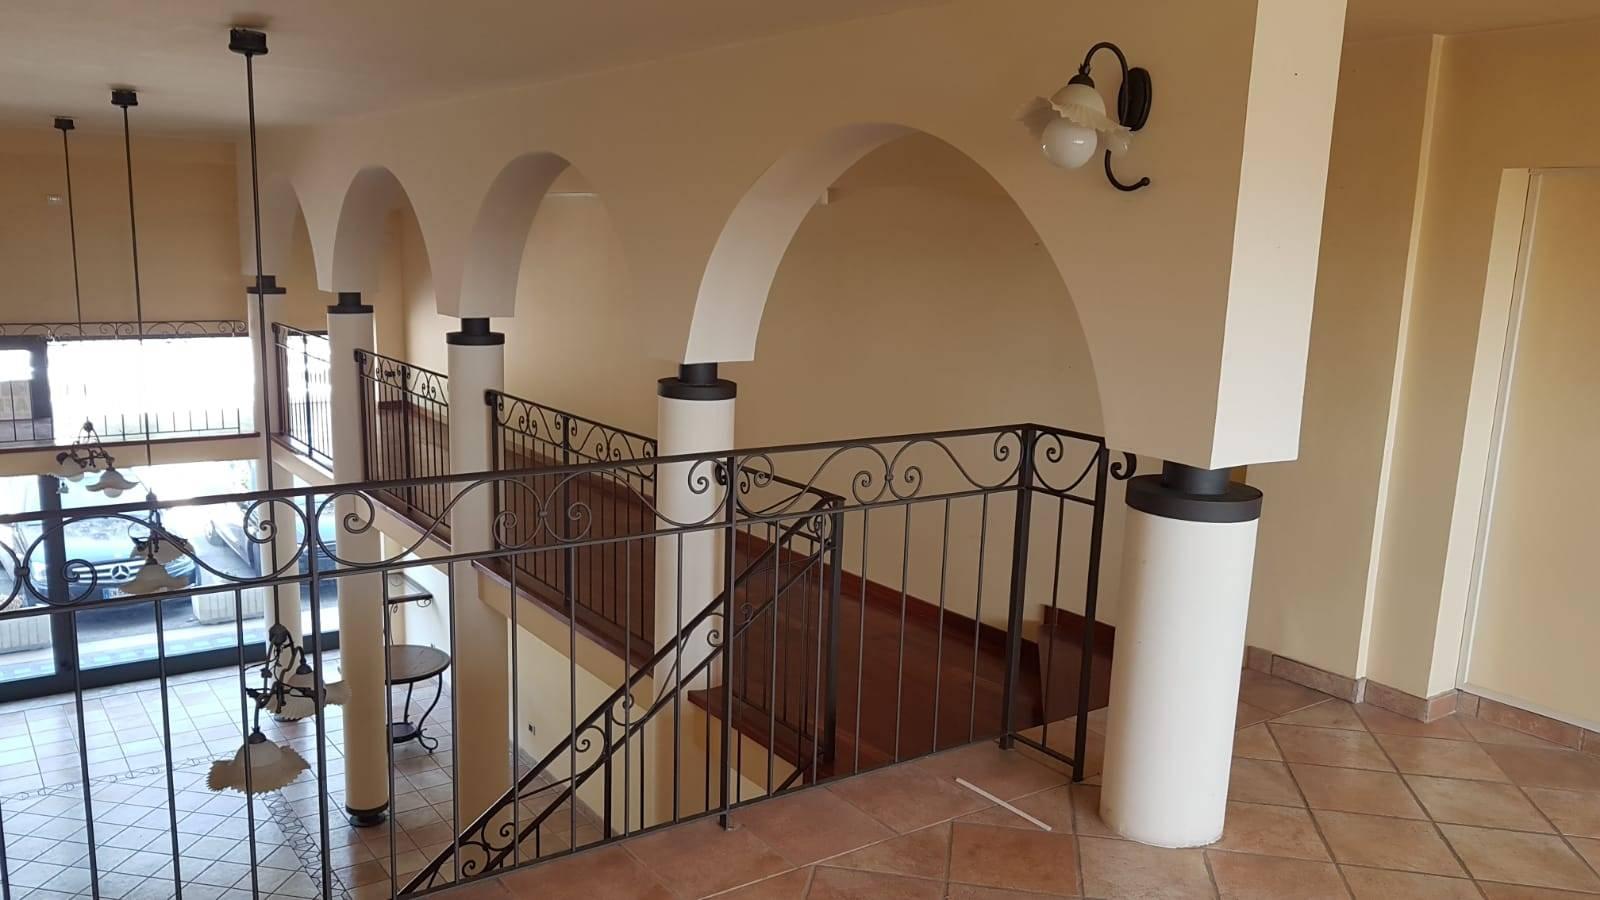 Fondo commerciale in affitto a Osimo (AN)